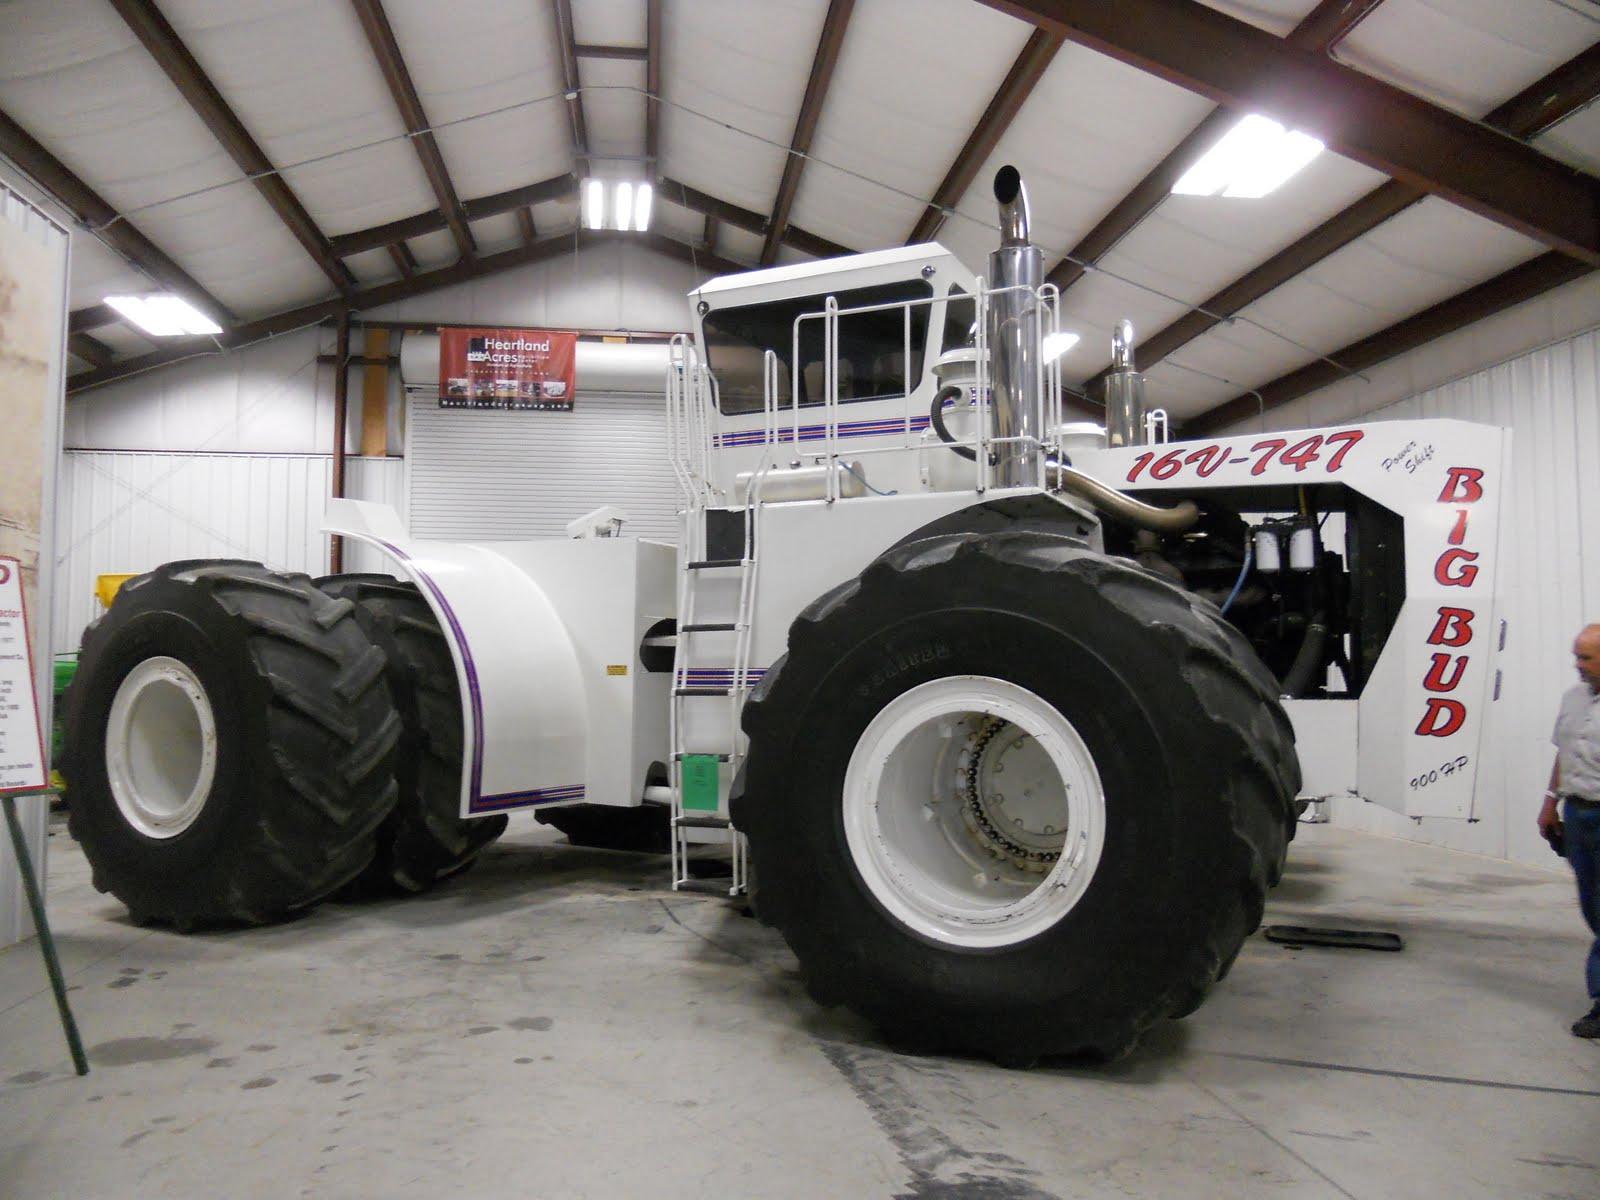 Punjabi Tractor Wallpaper   Biggest Tractor In The World Hd 1600x1200